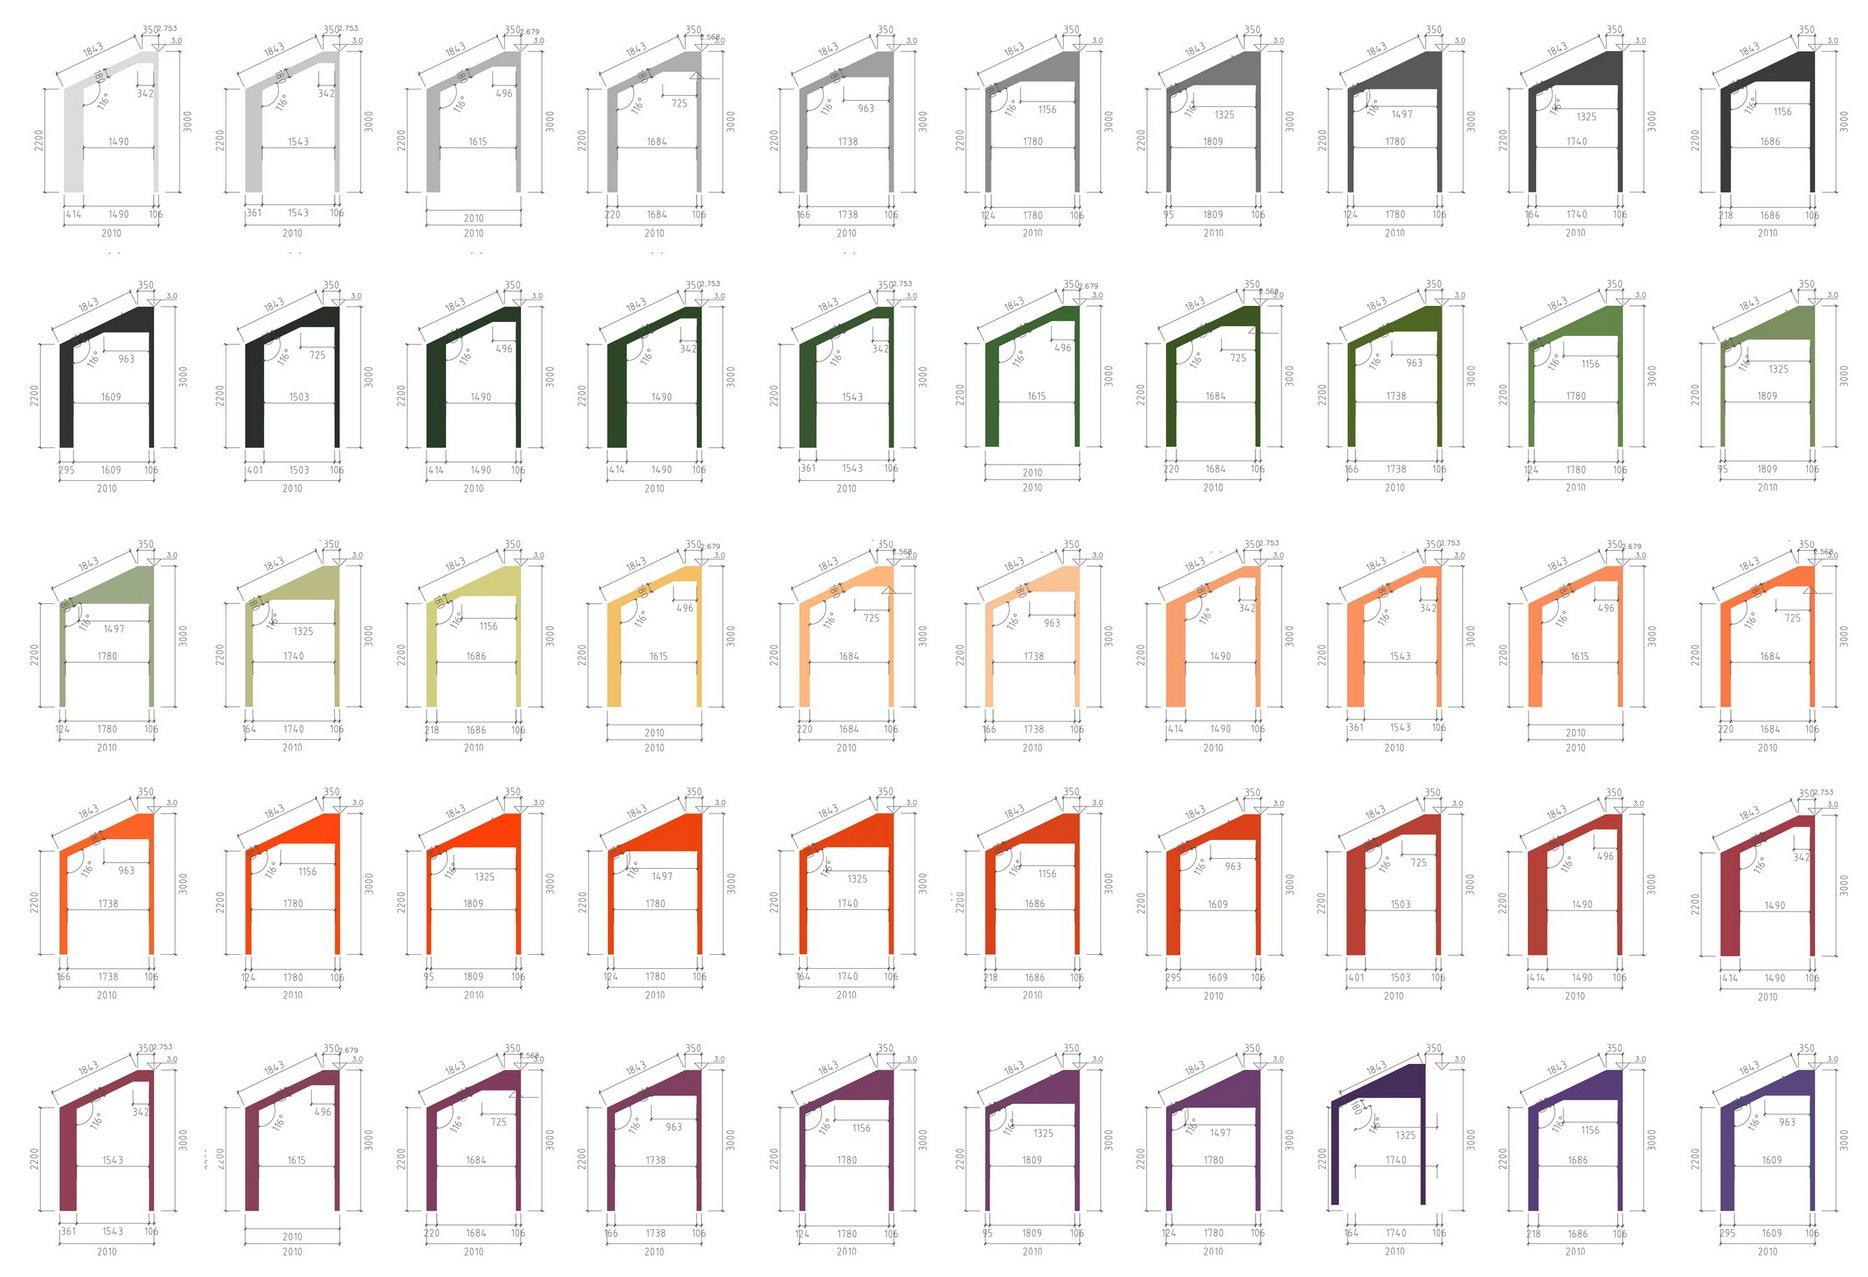 Analysis diagram 005 HDD}